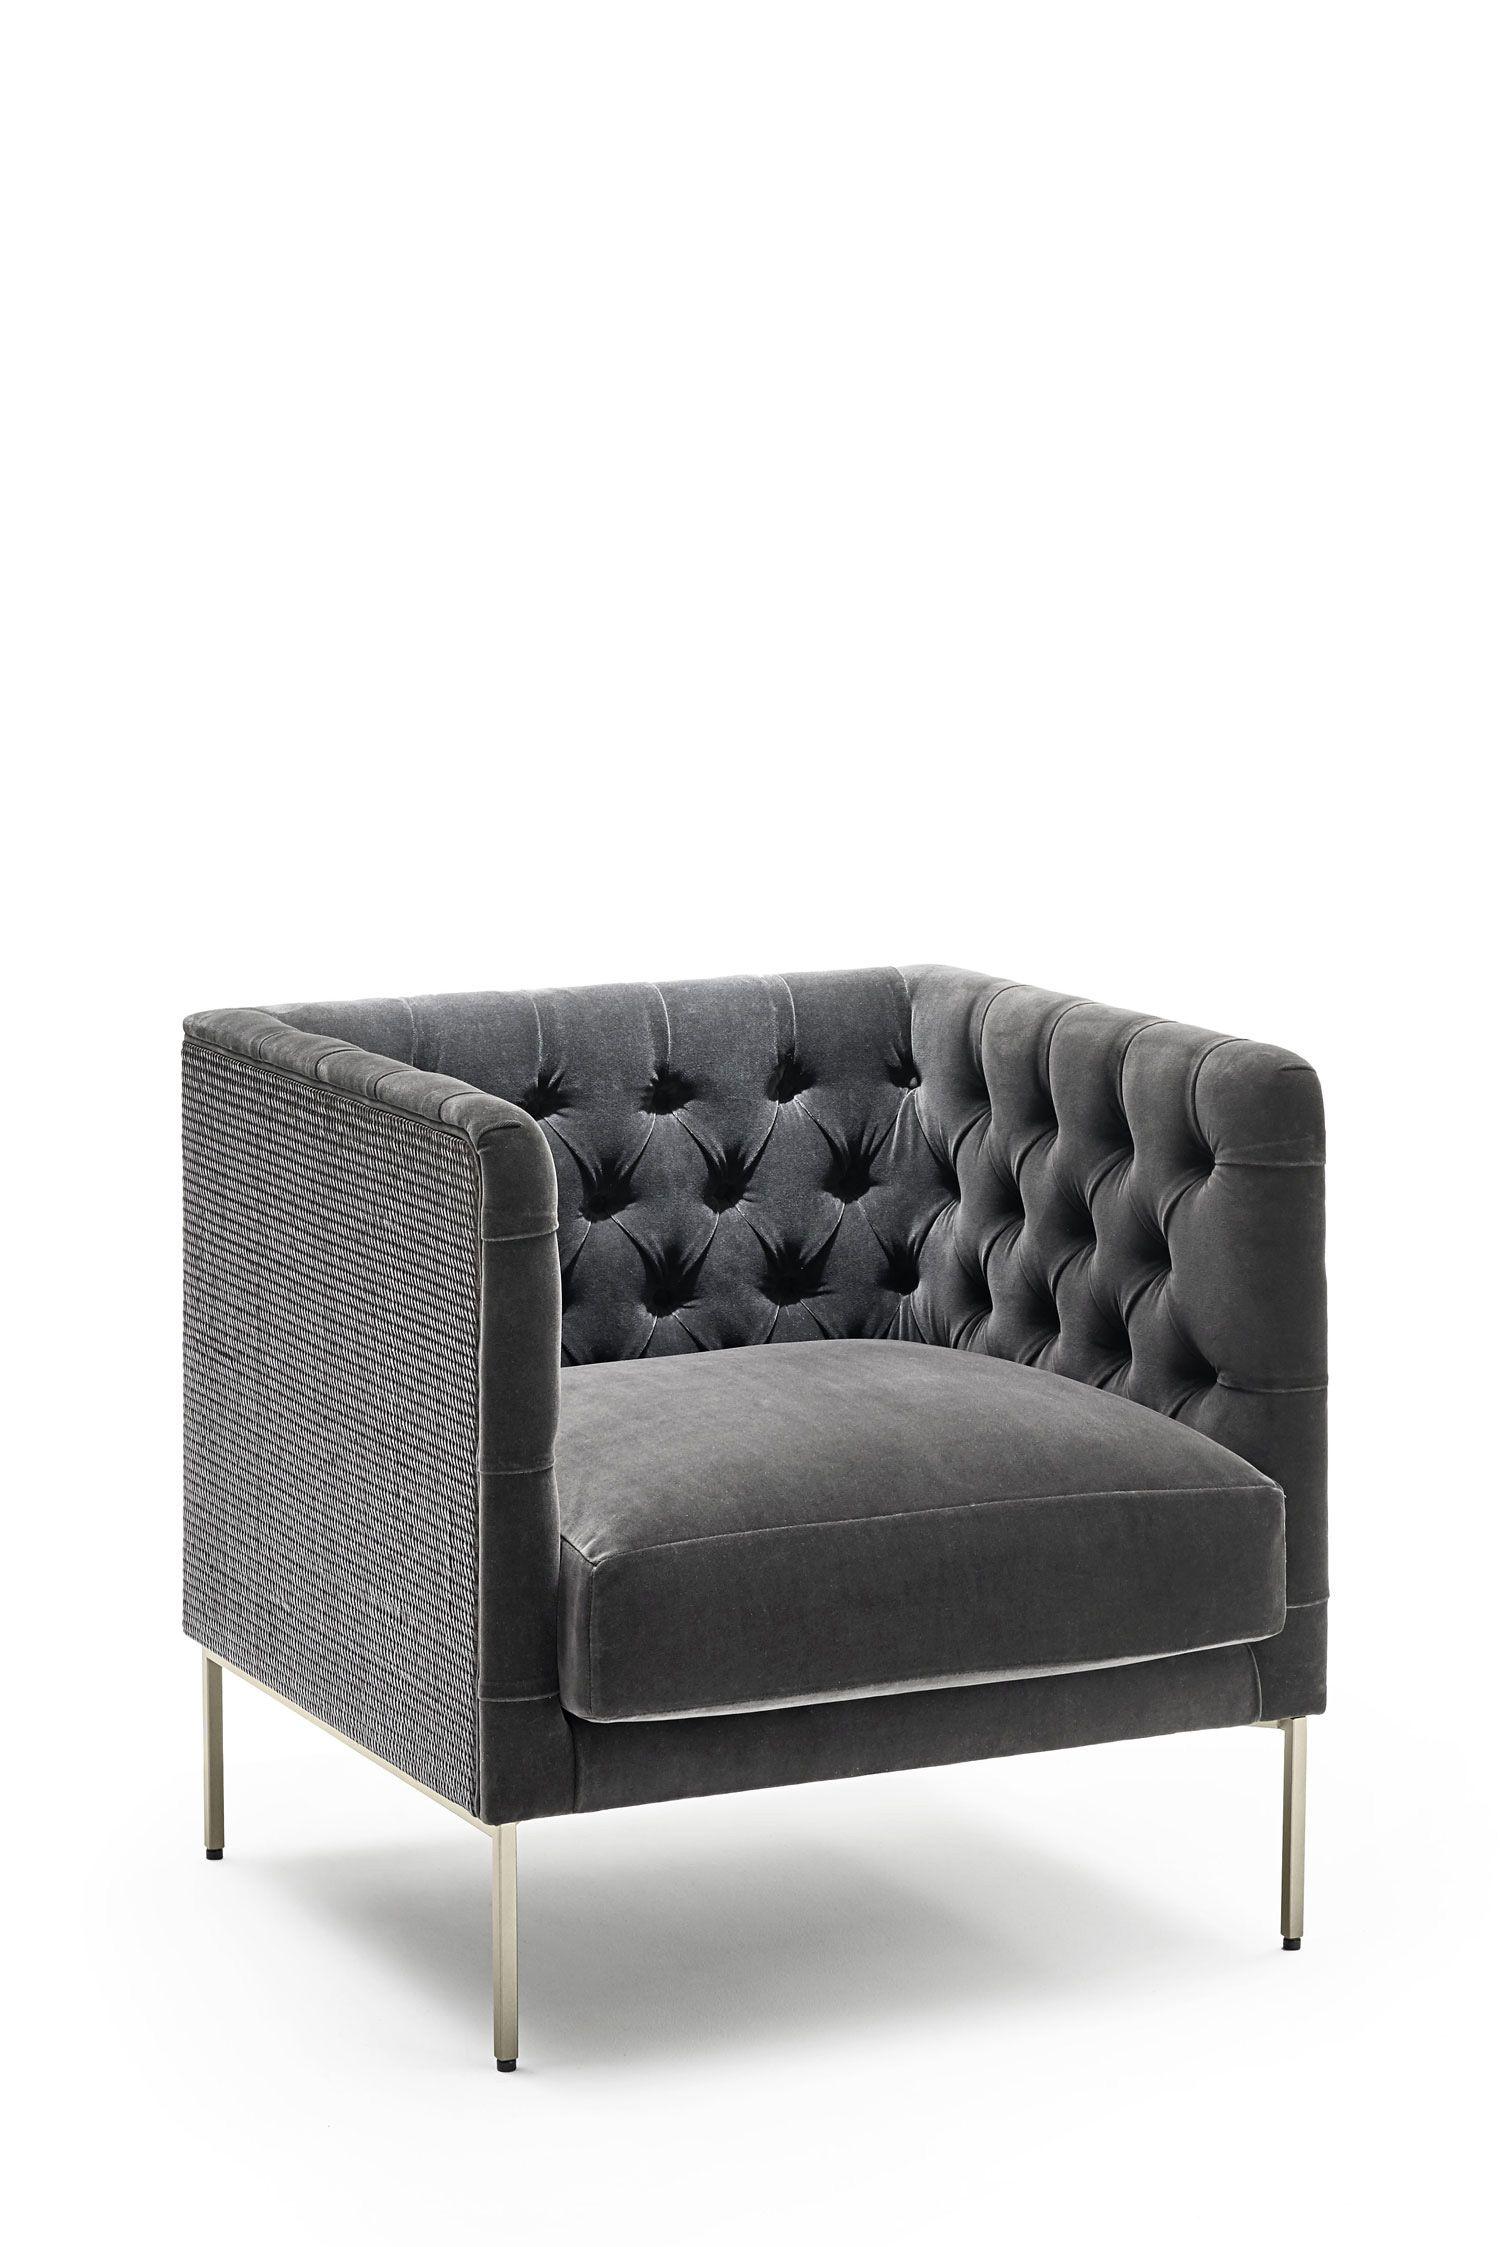 Lipp Armchair by Living Divani at Salone del Mobile 2017